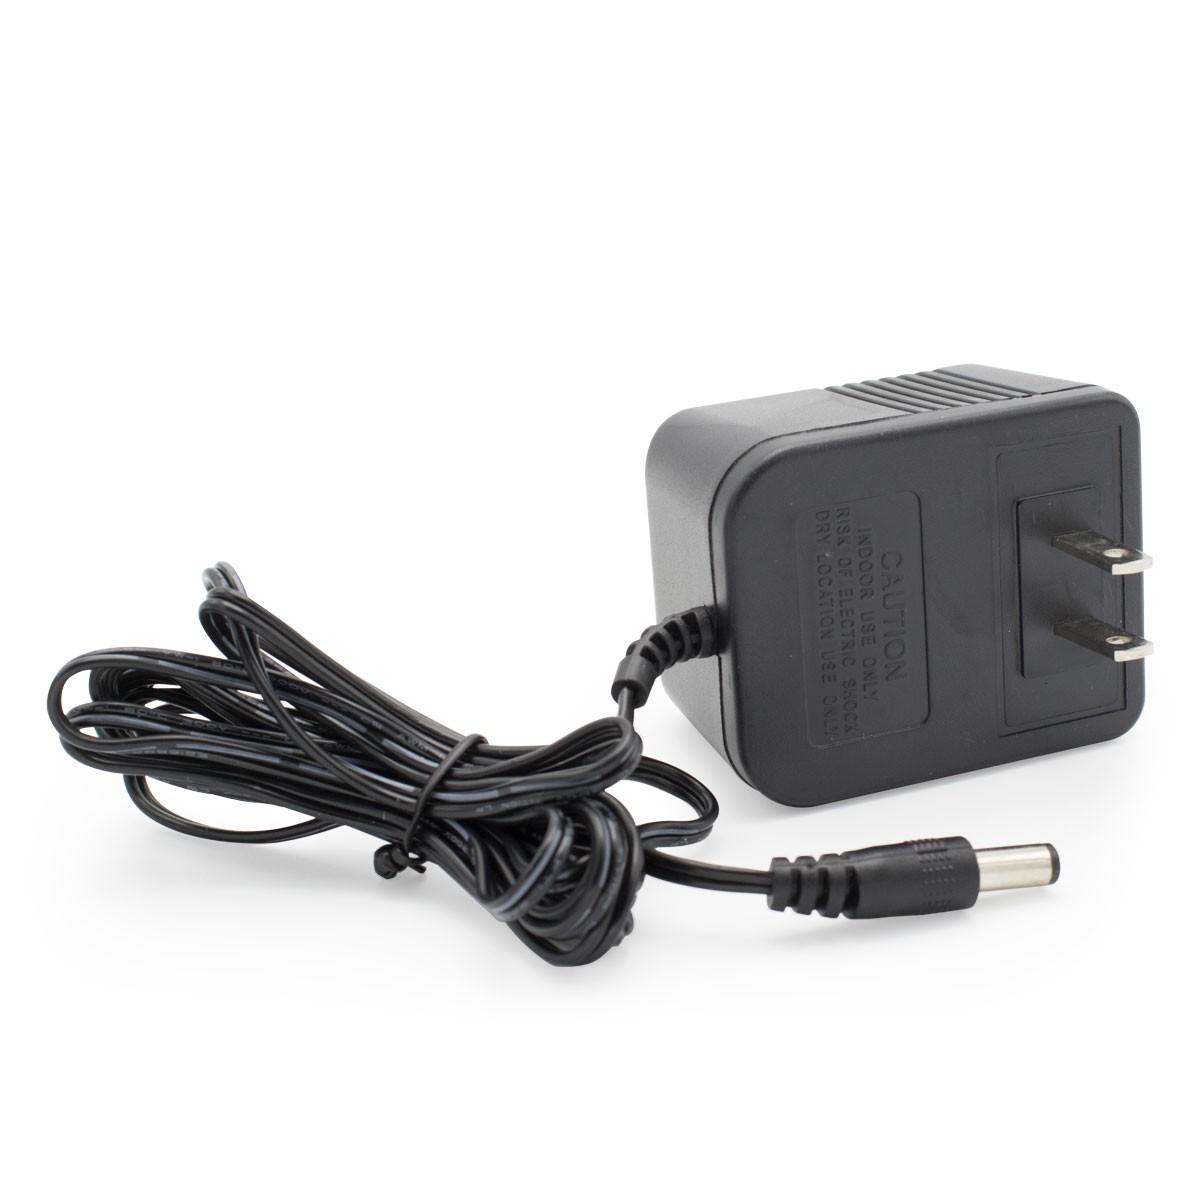 Power Adapter 115 VAC to 12 VDC - HI710005